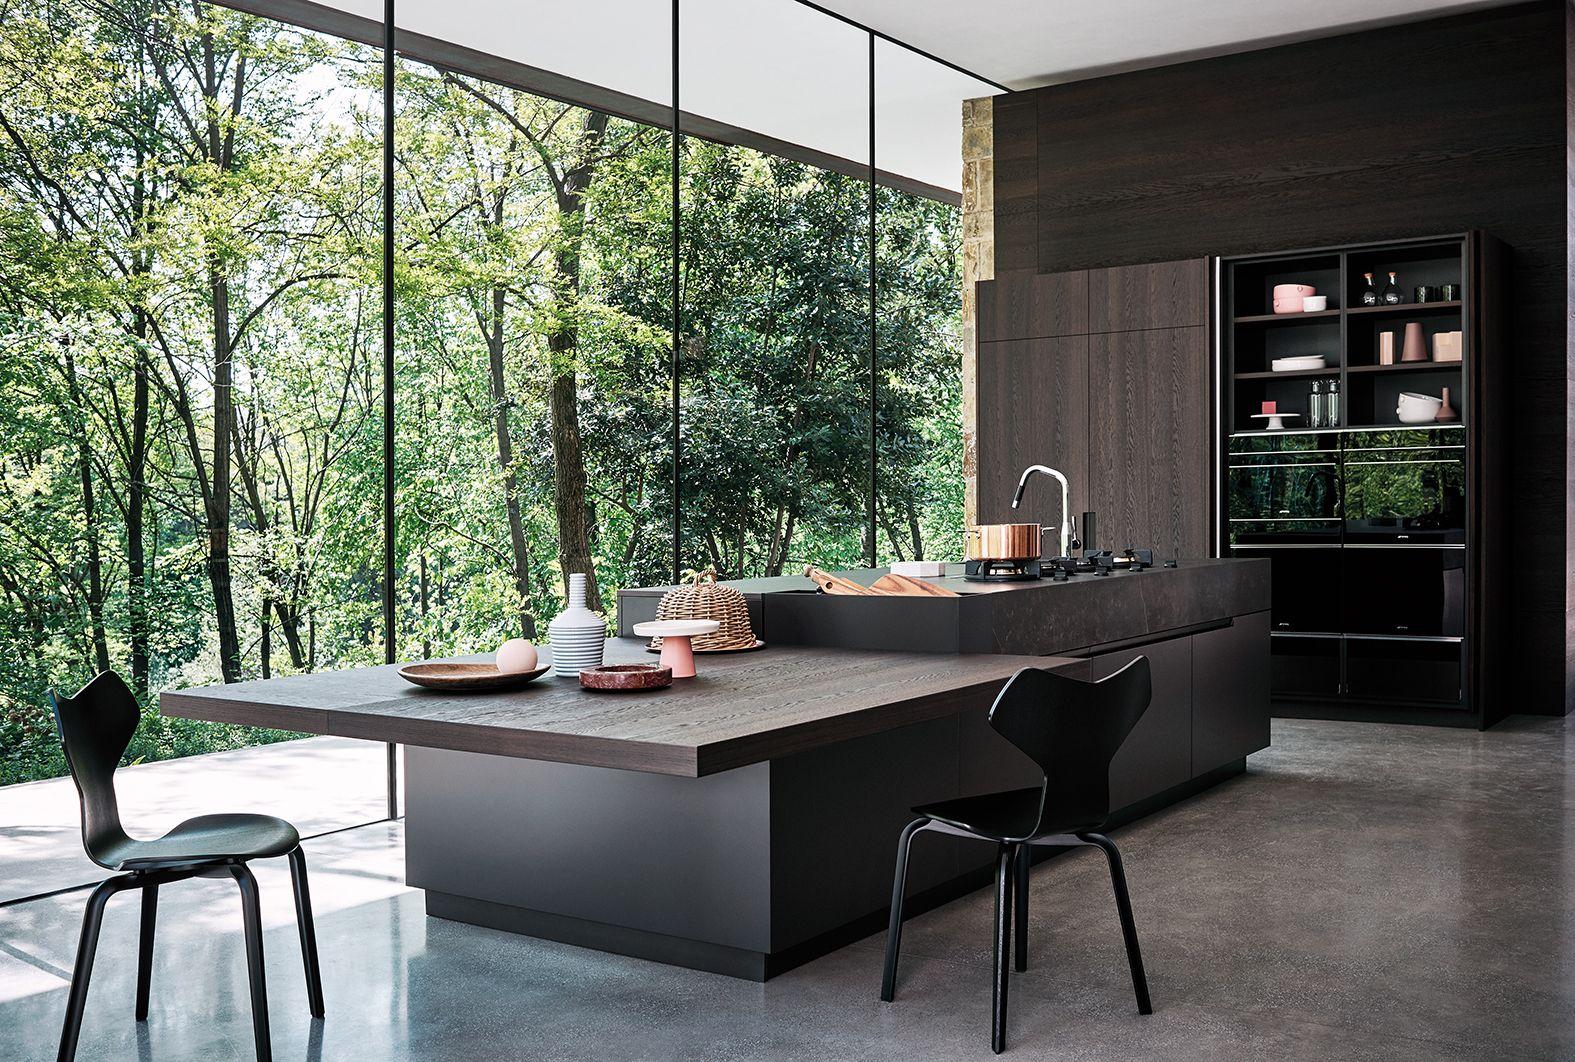 Cesar Maxima 2 2 Modern Kitchen Cesar Nyc Kitchens Modern Design Italian Kitchen Cabinets Elegant Kitchens Modern Kitchen Design